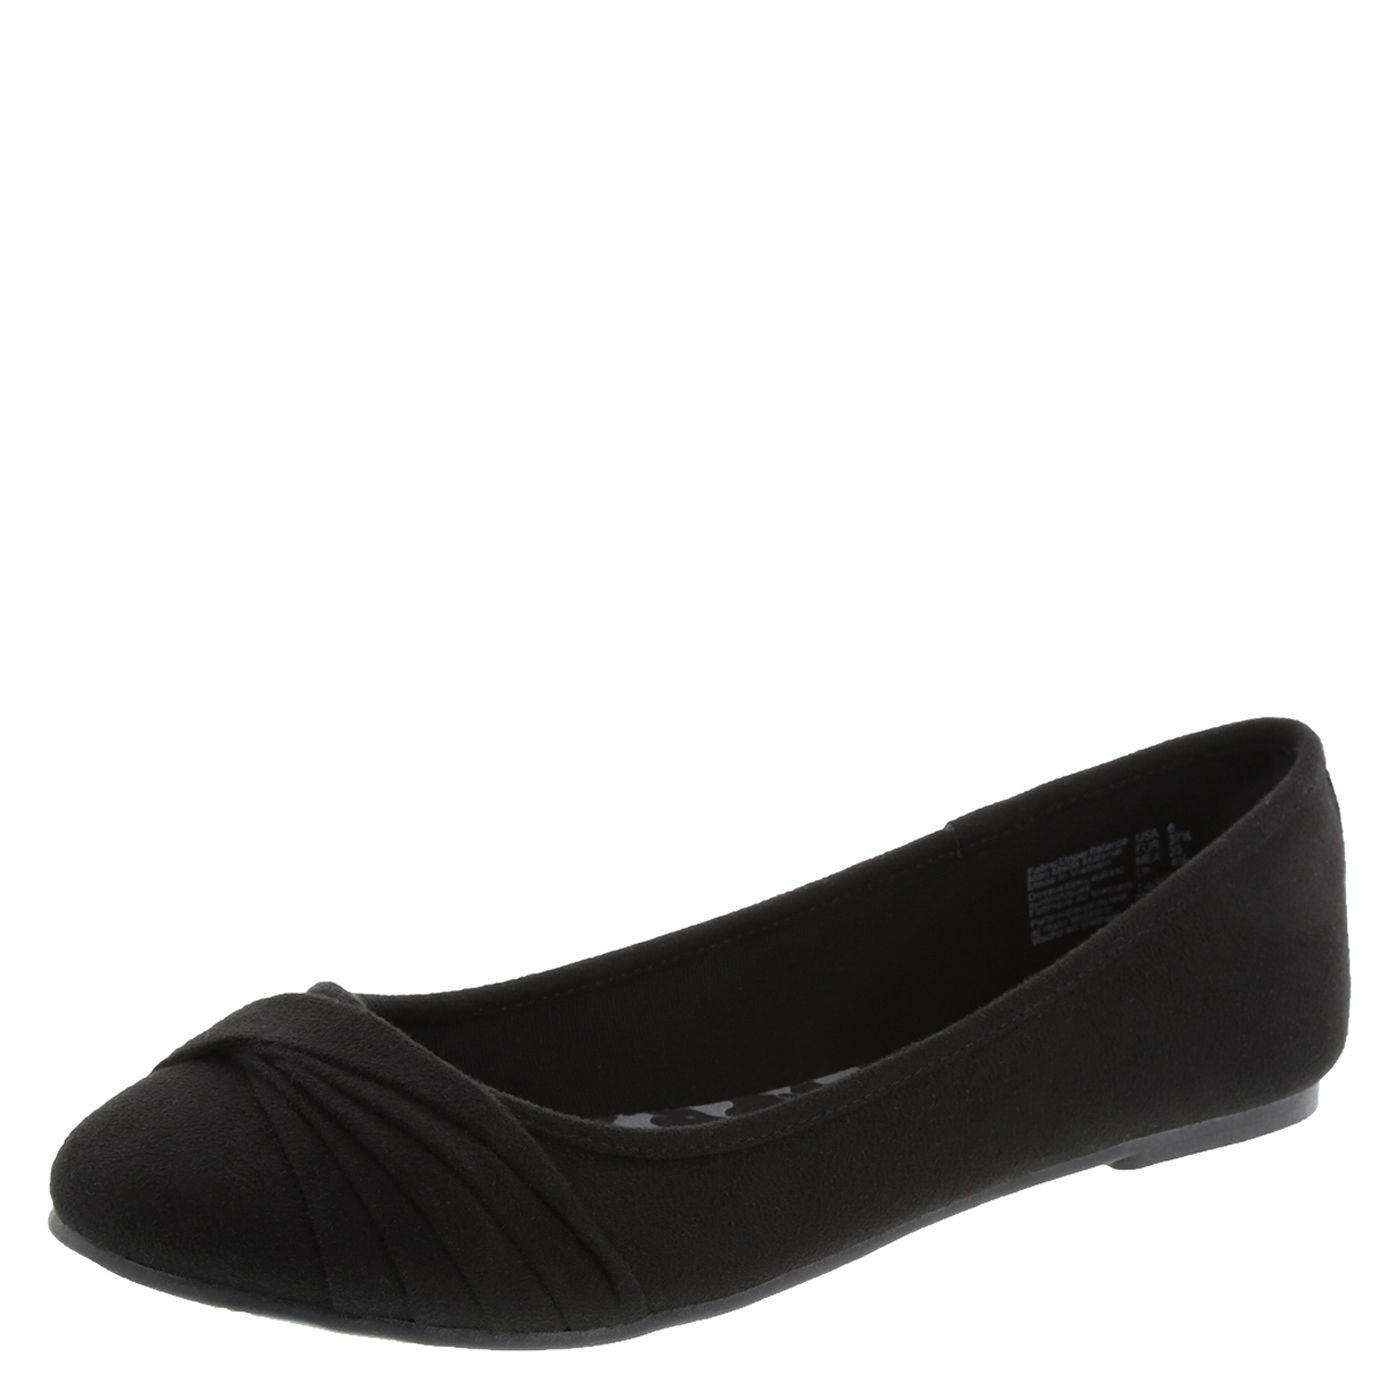 Women shoes, Womens black flats